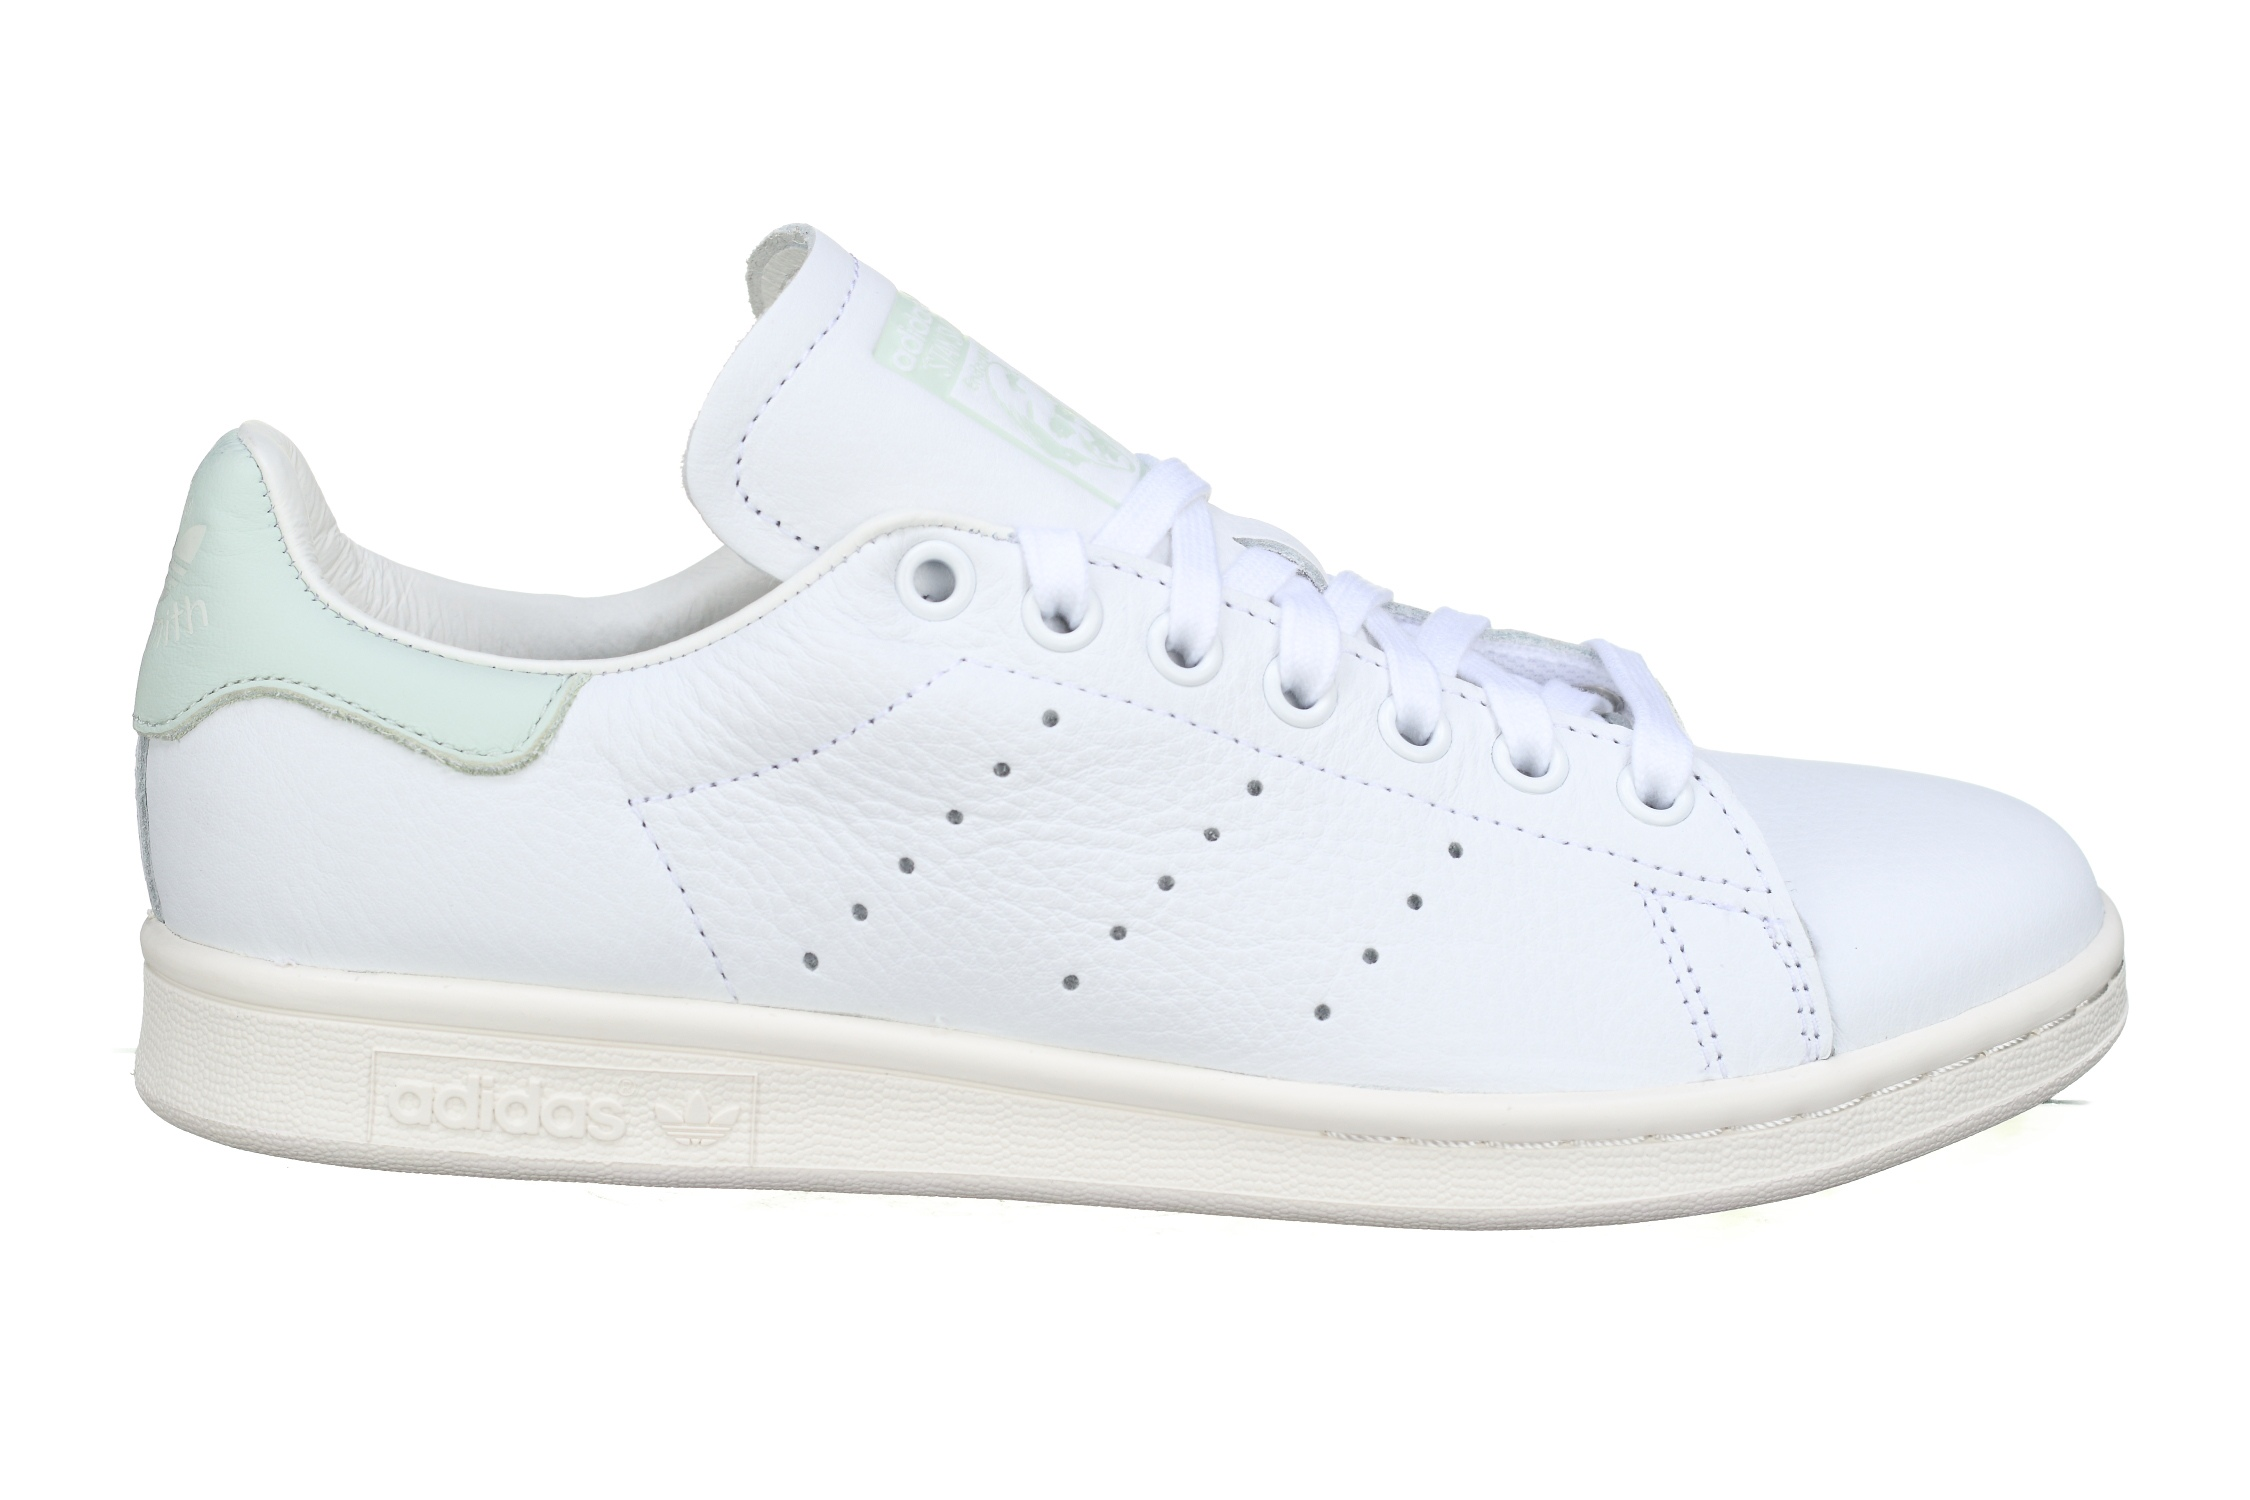 http://www.leadermode.com/175469/adidas-stan-smith-ef9289-blanc-vert.jpg